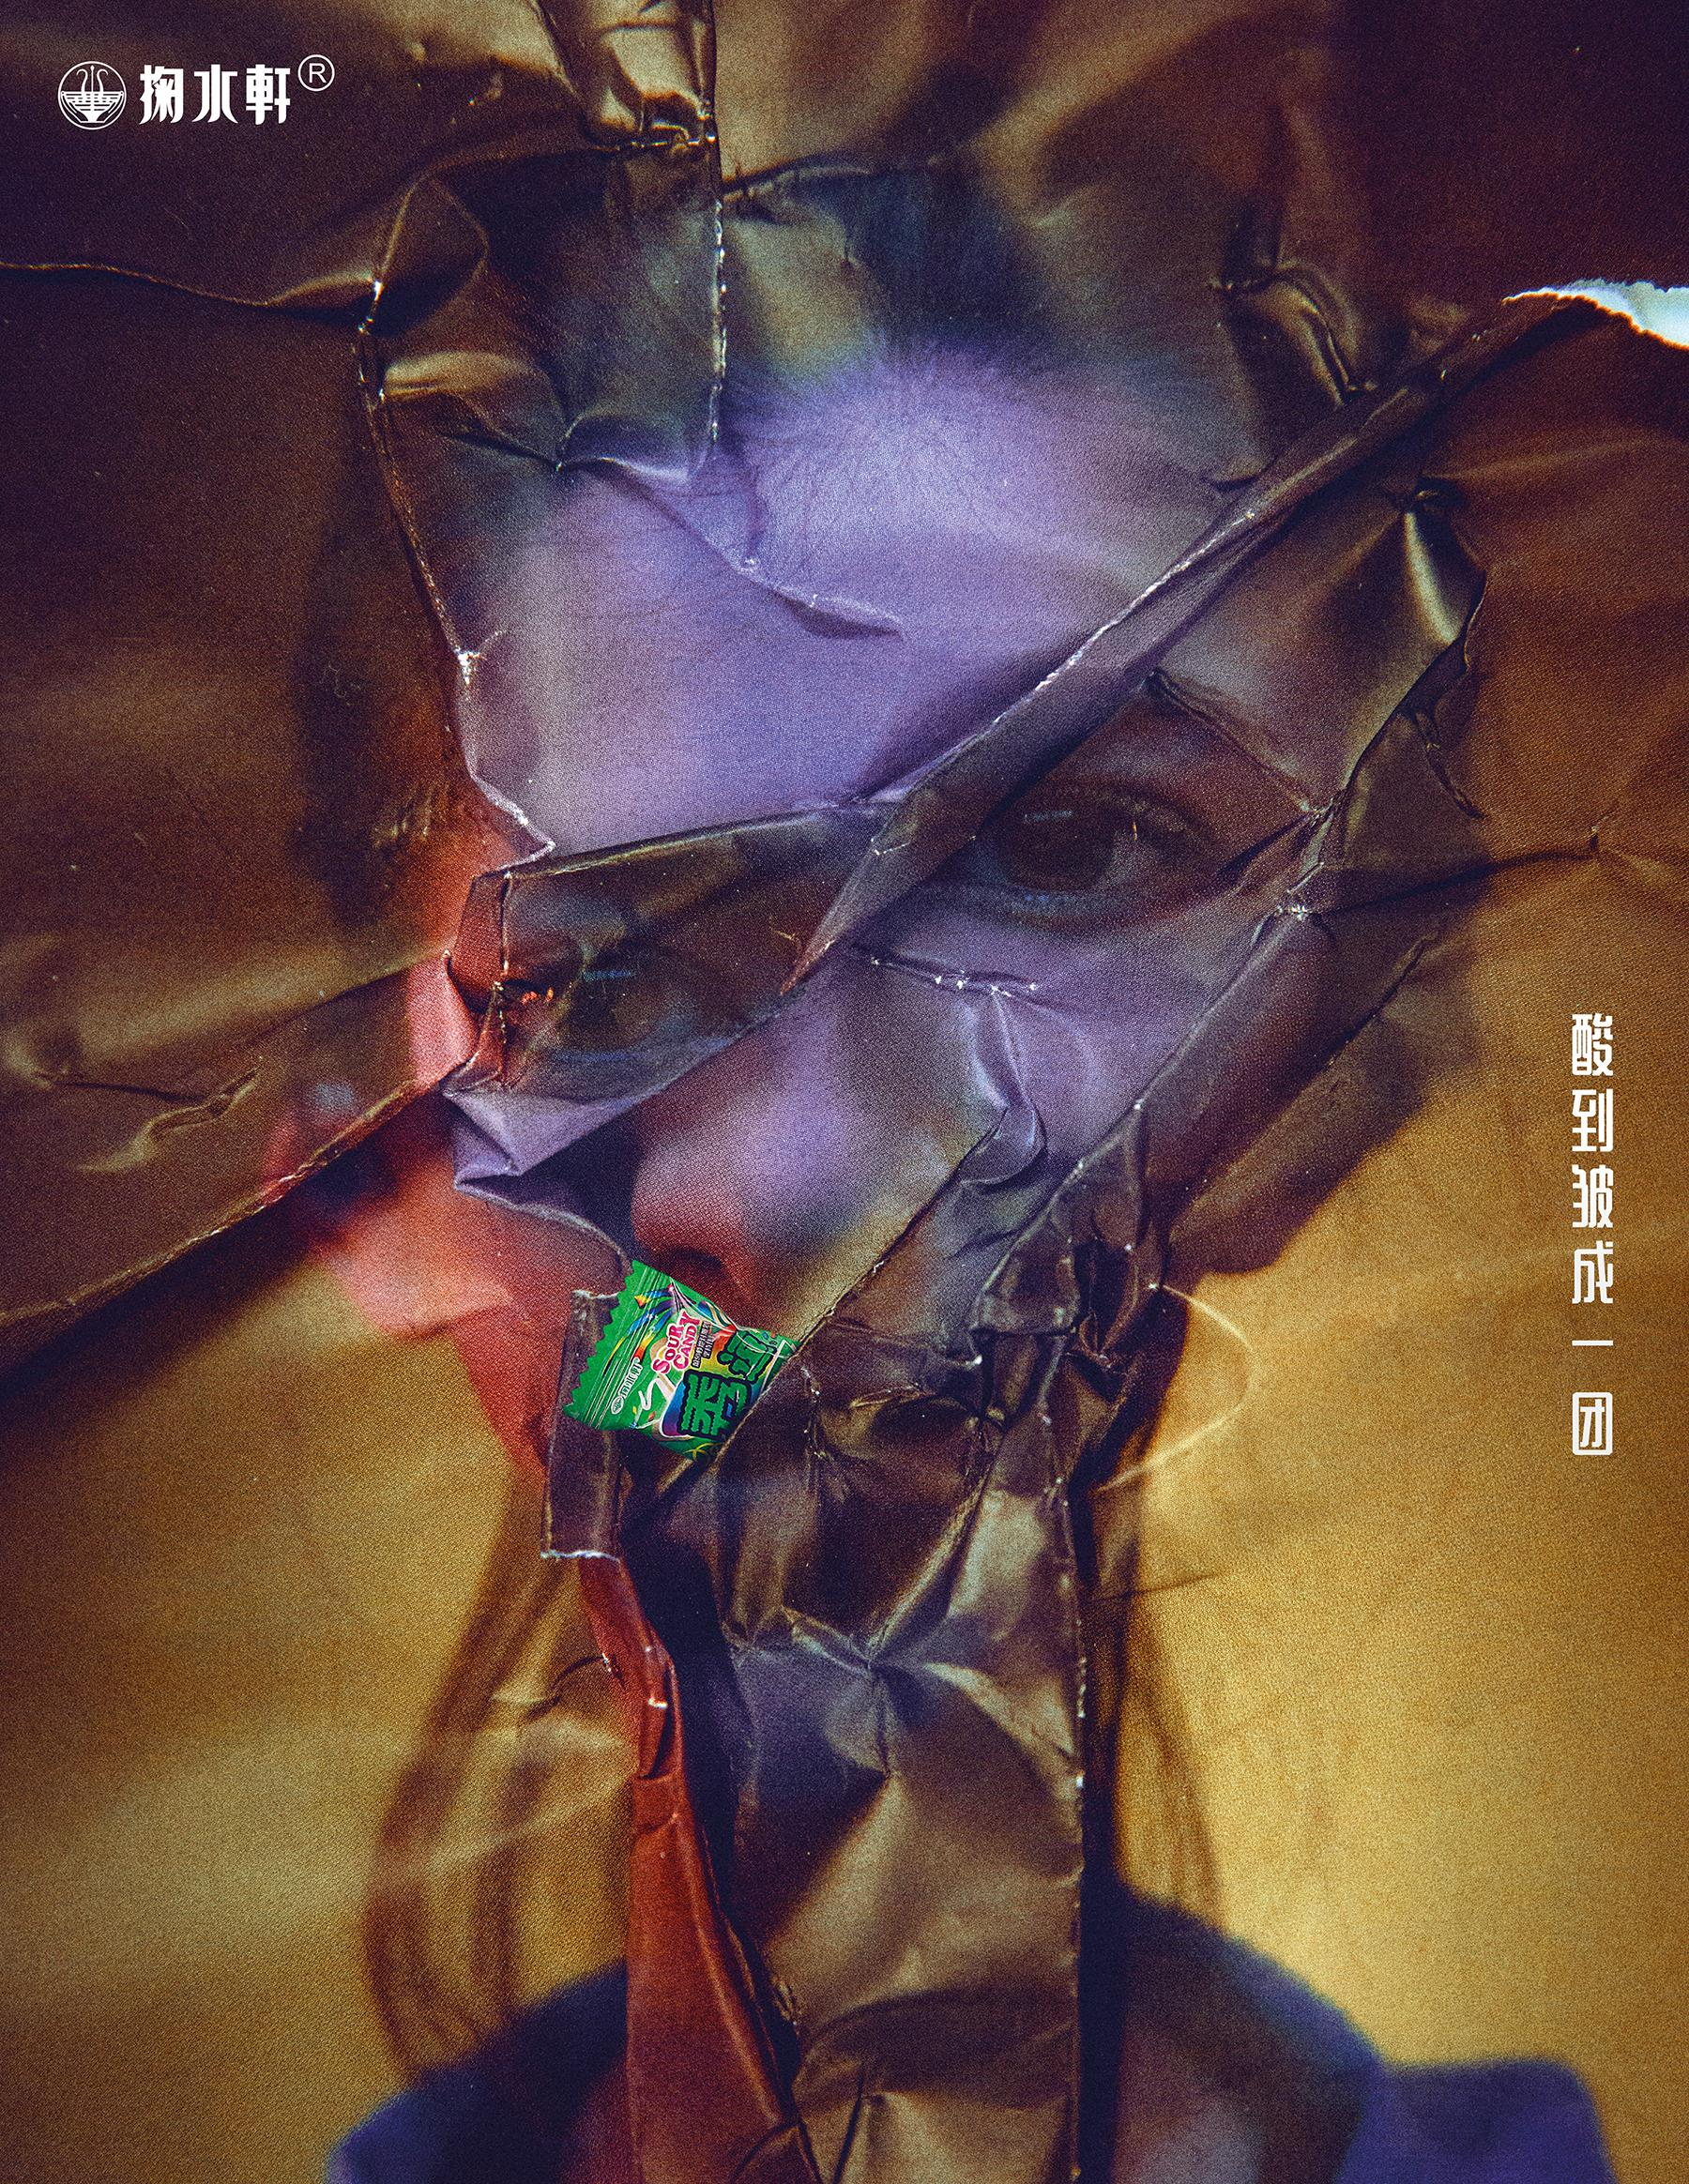 Xiu Dou Print Ad - Sour Faces, 1